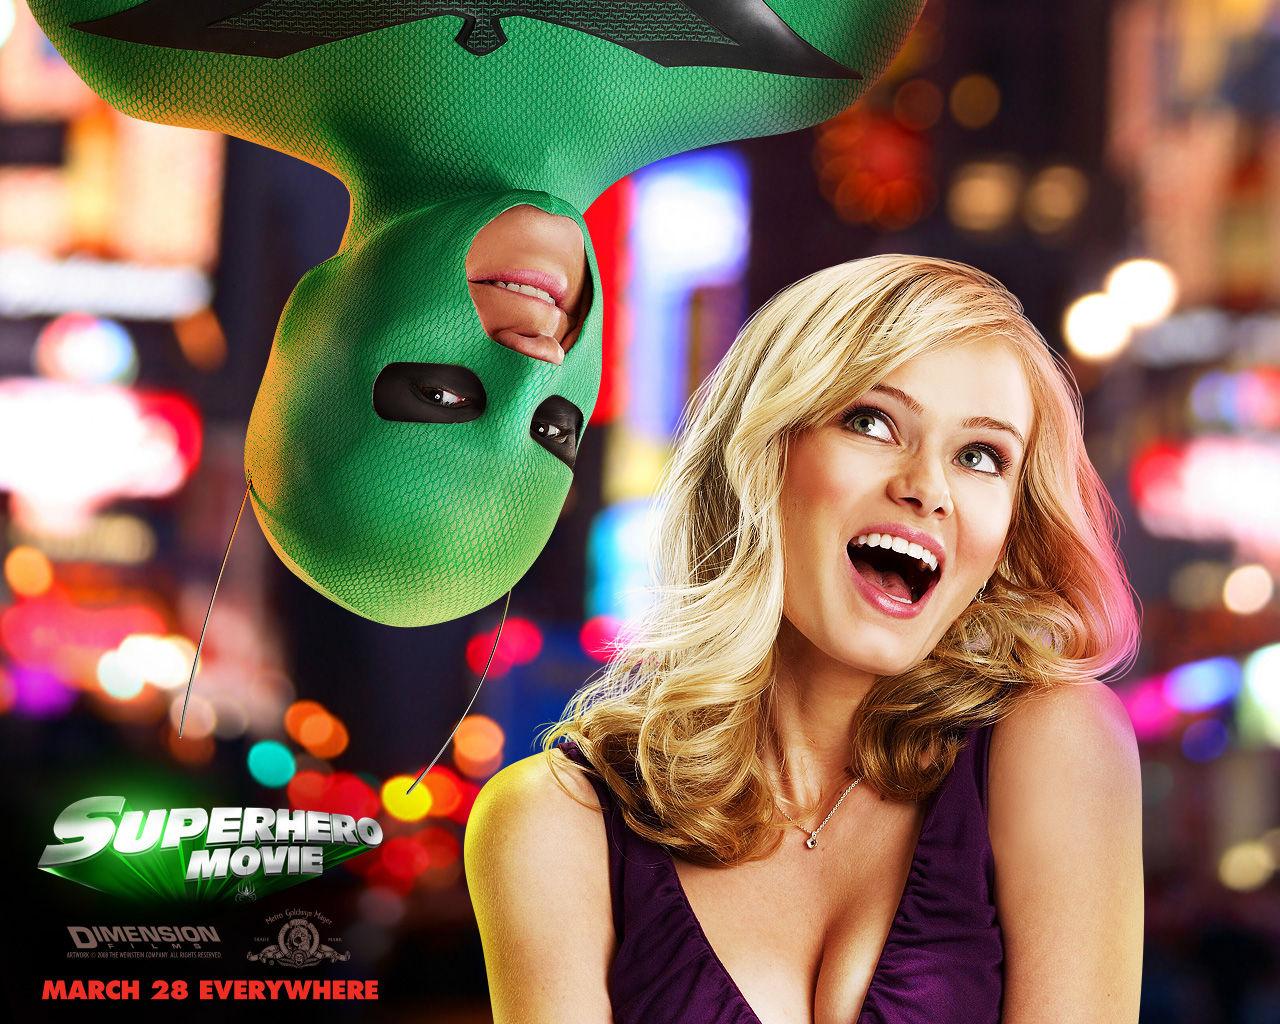 Superhero Movie Wallpaper   10012746 1280x1024 1280x1024